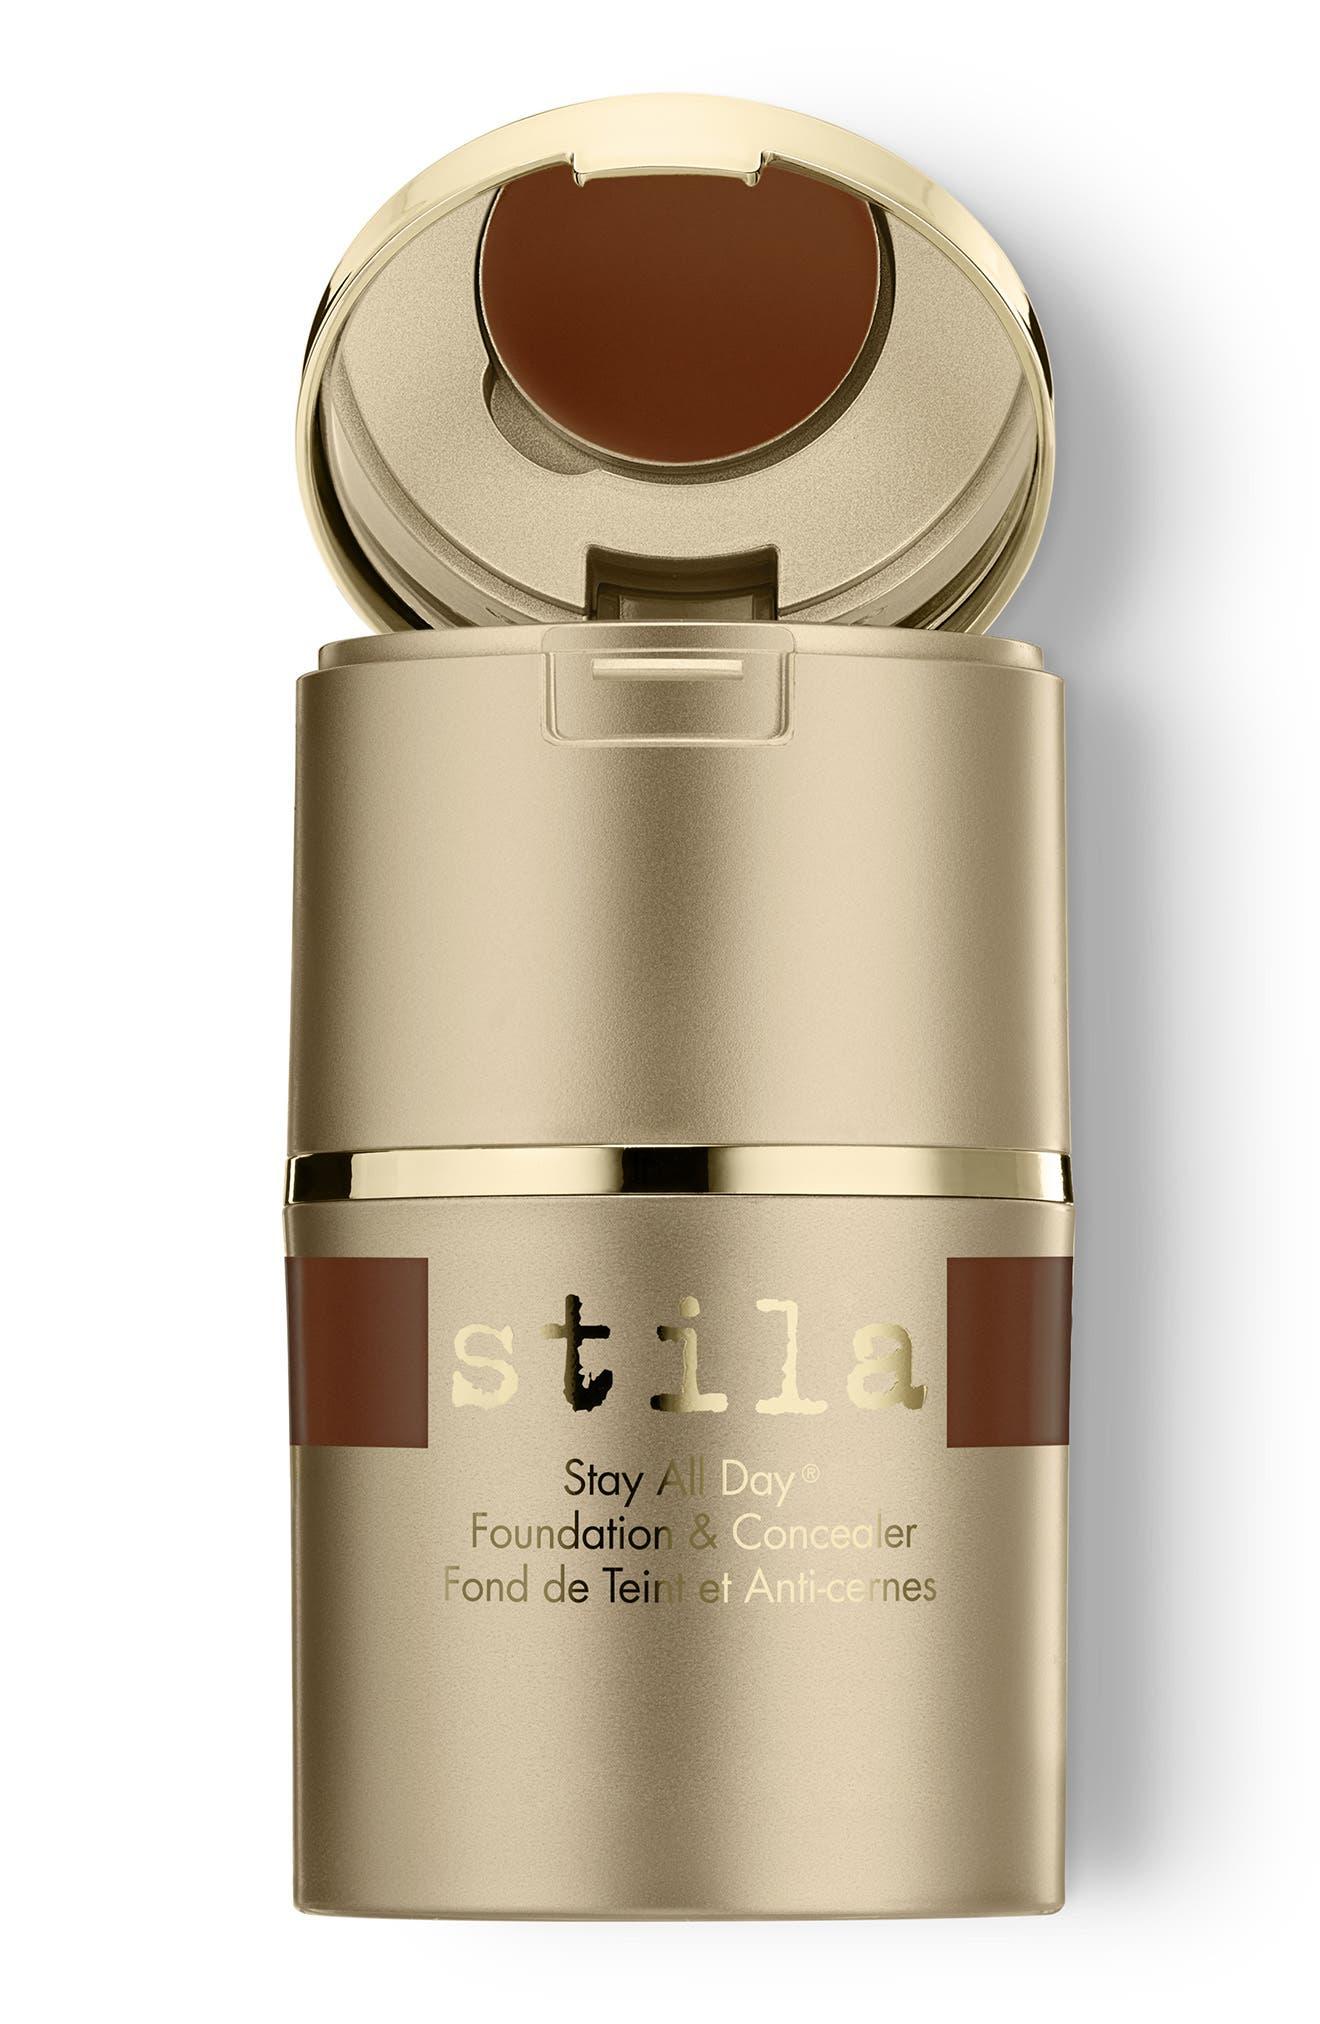 Image of Stila Stay All Day Foundation & Concealer - Espresso 15